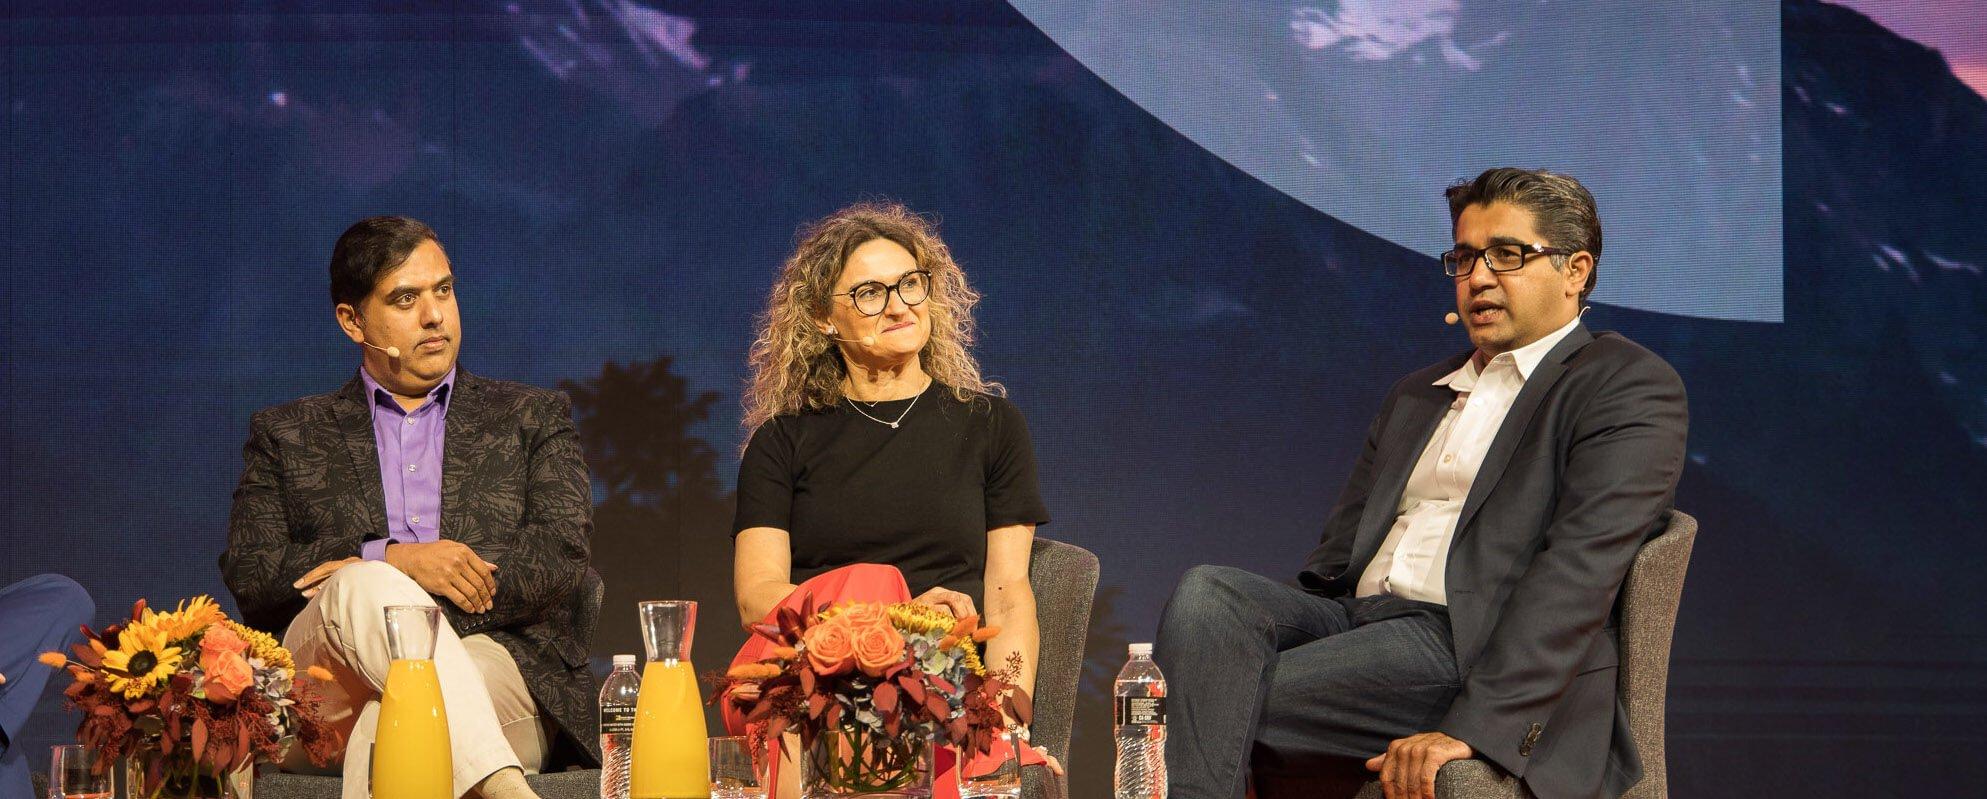 automation helps cio drive innovative culture